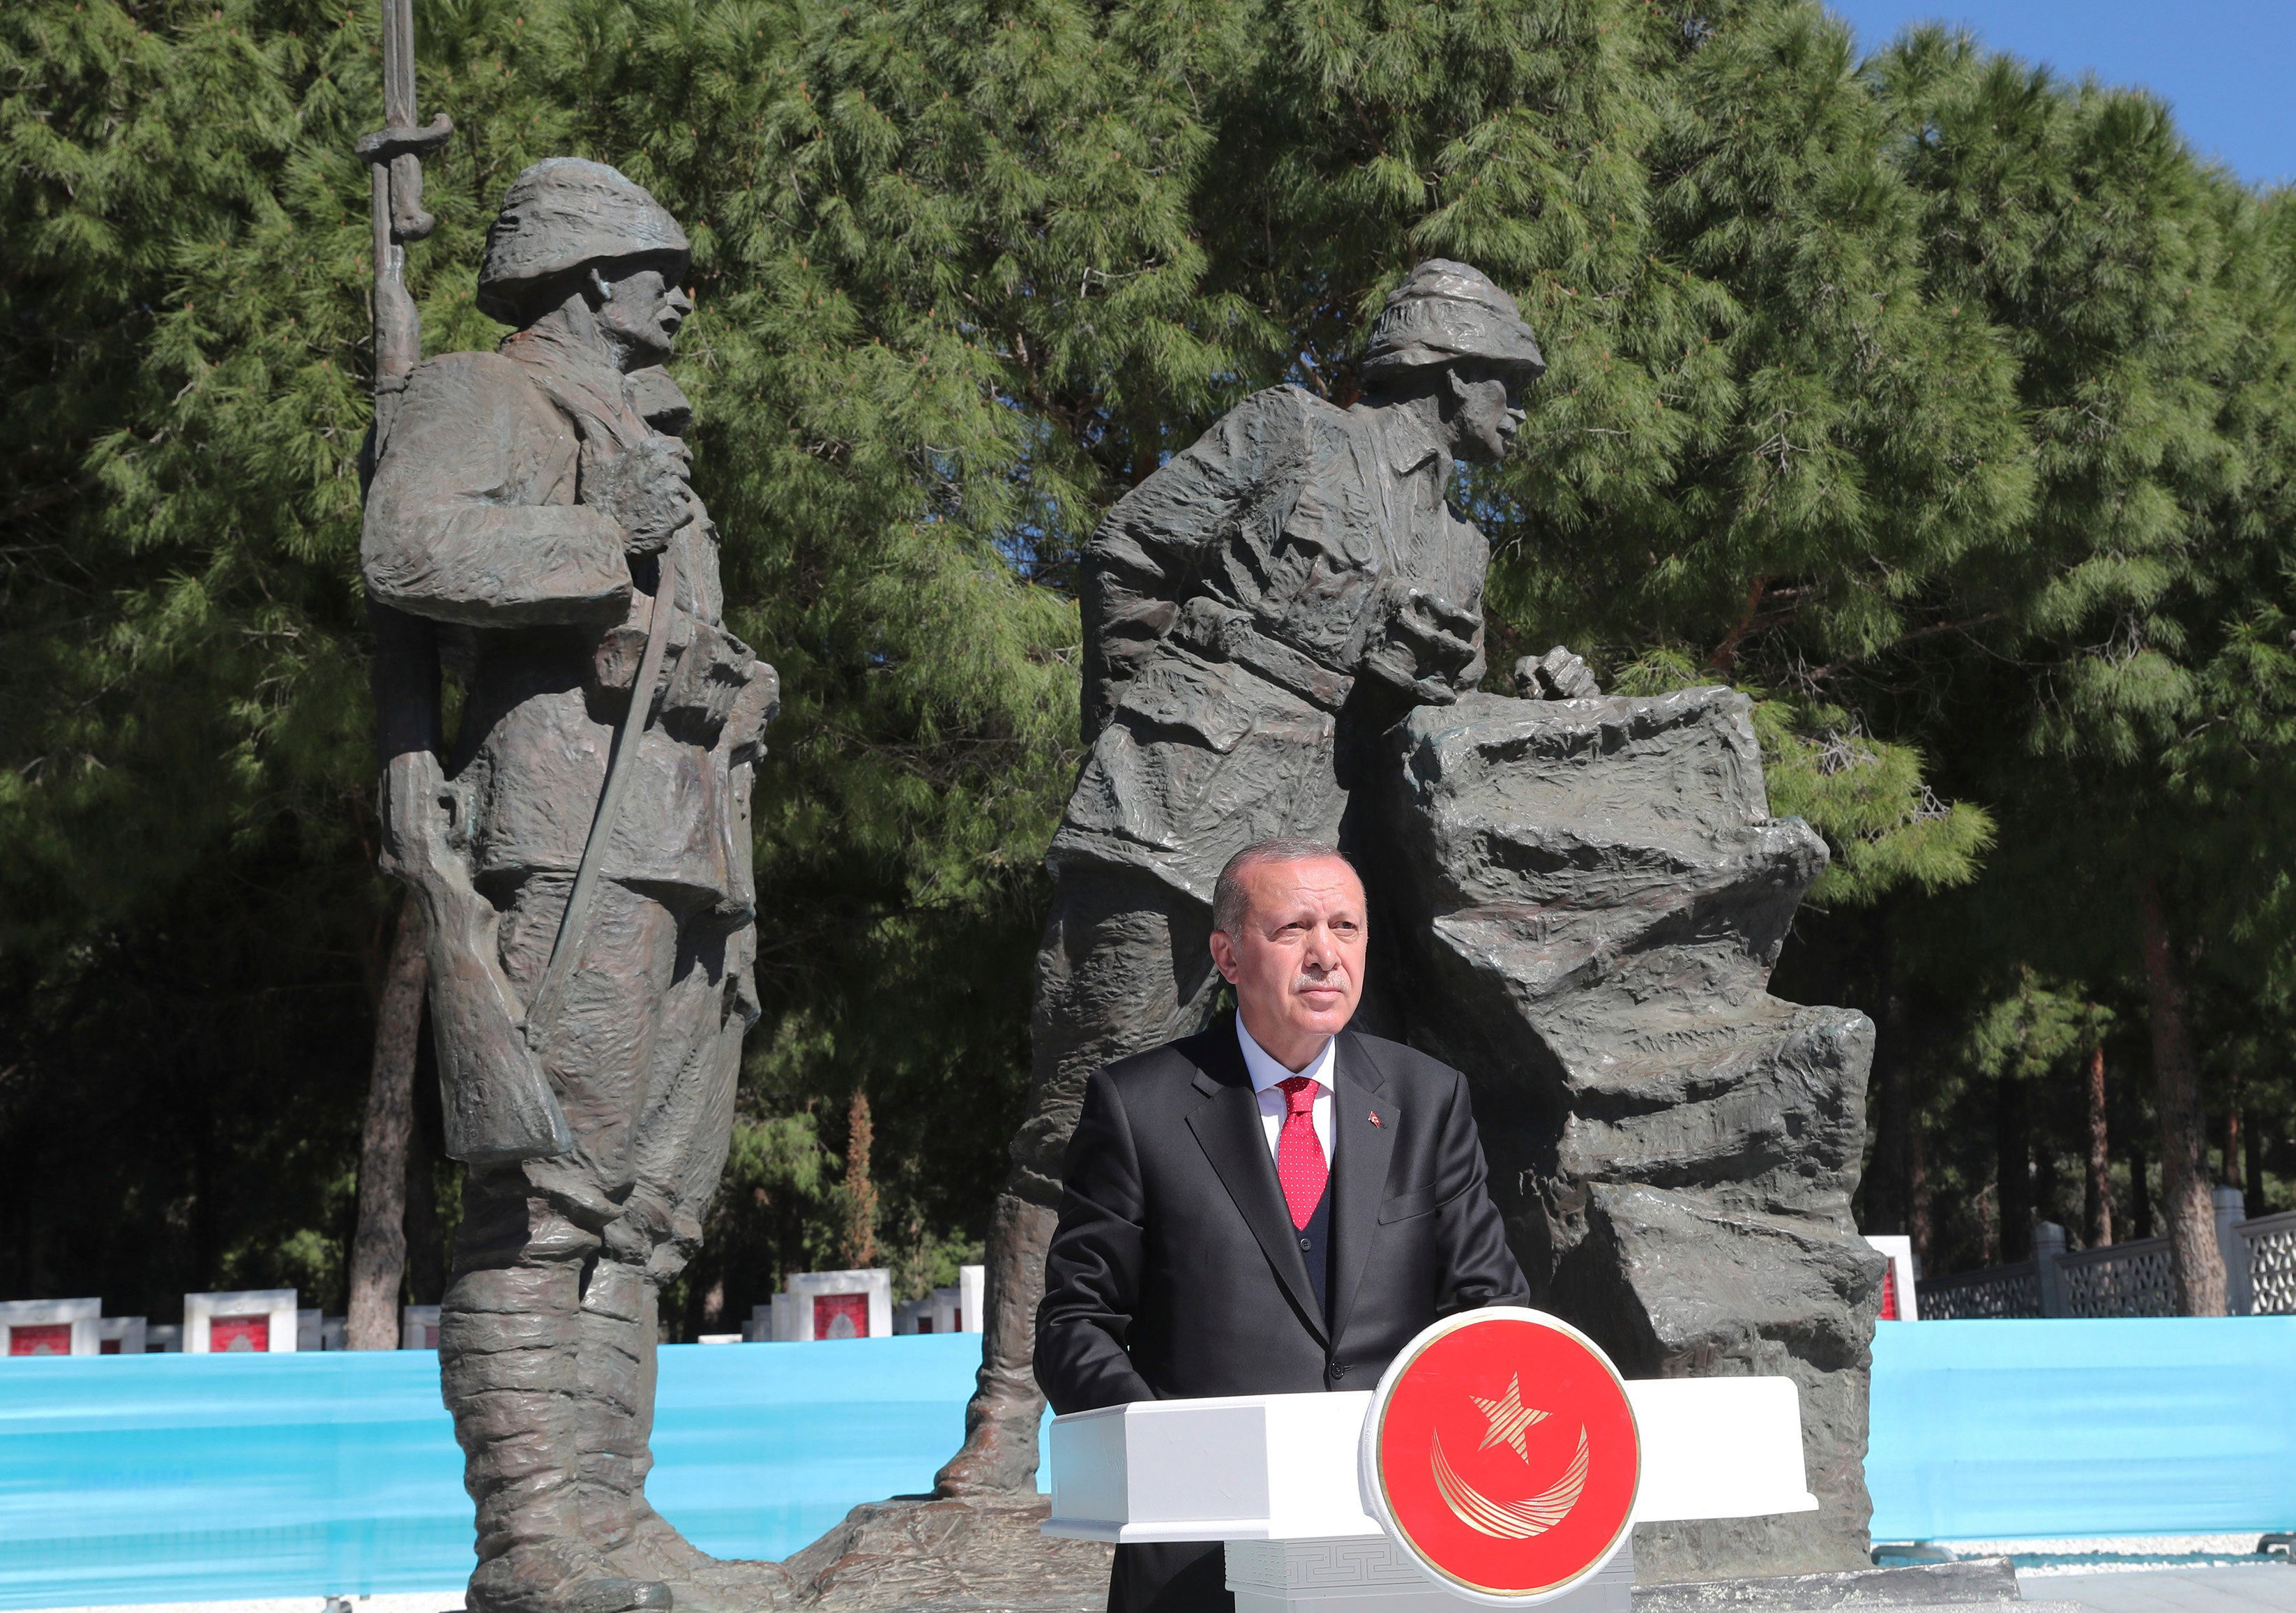 O Ερντογάν απειλεί να στείλει πίσω «σε φέρετρα» όσους στοχοποιούν την